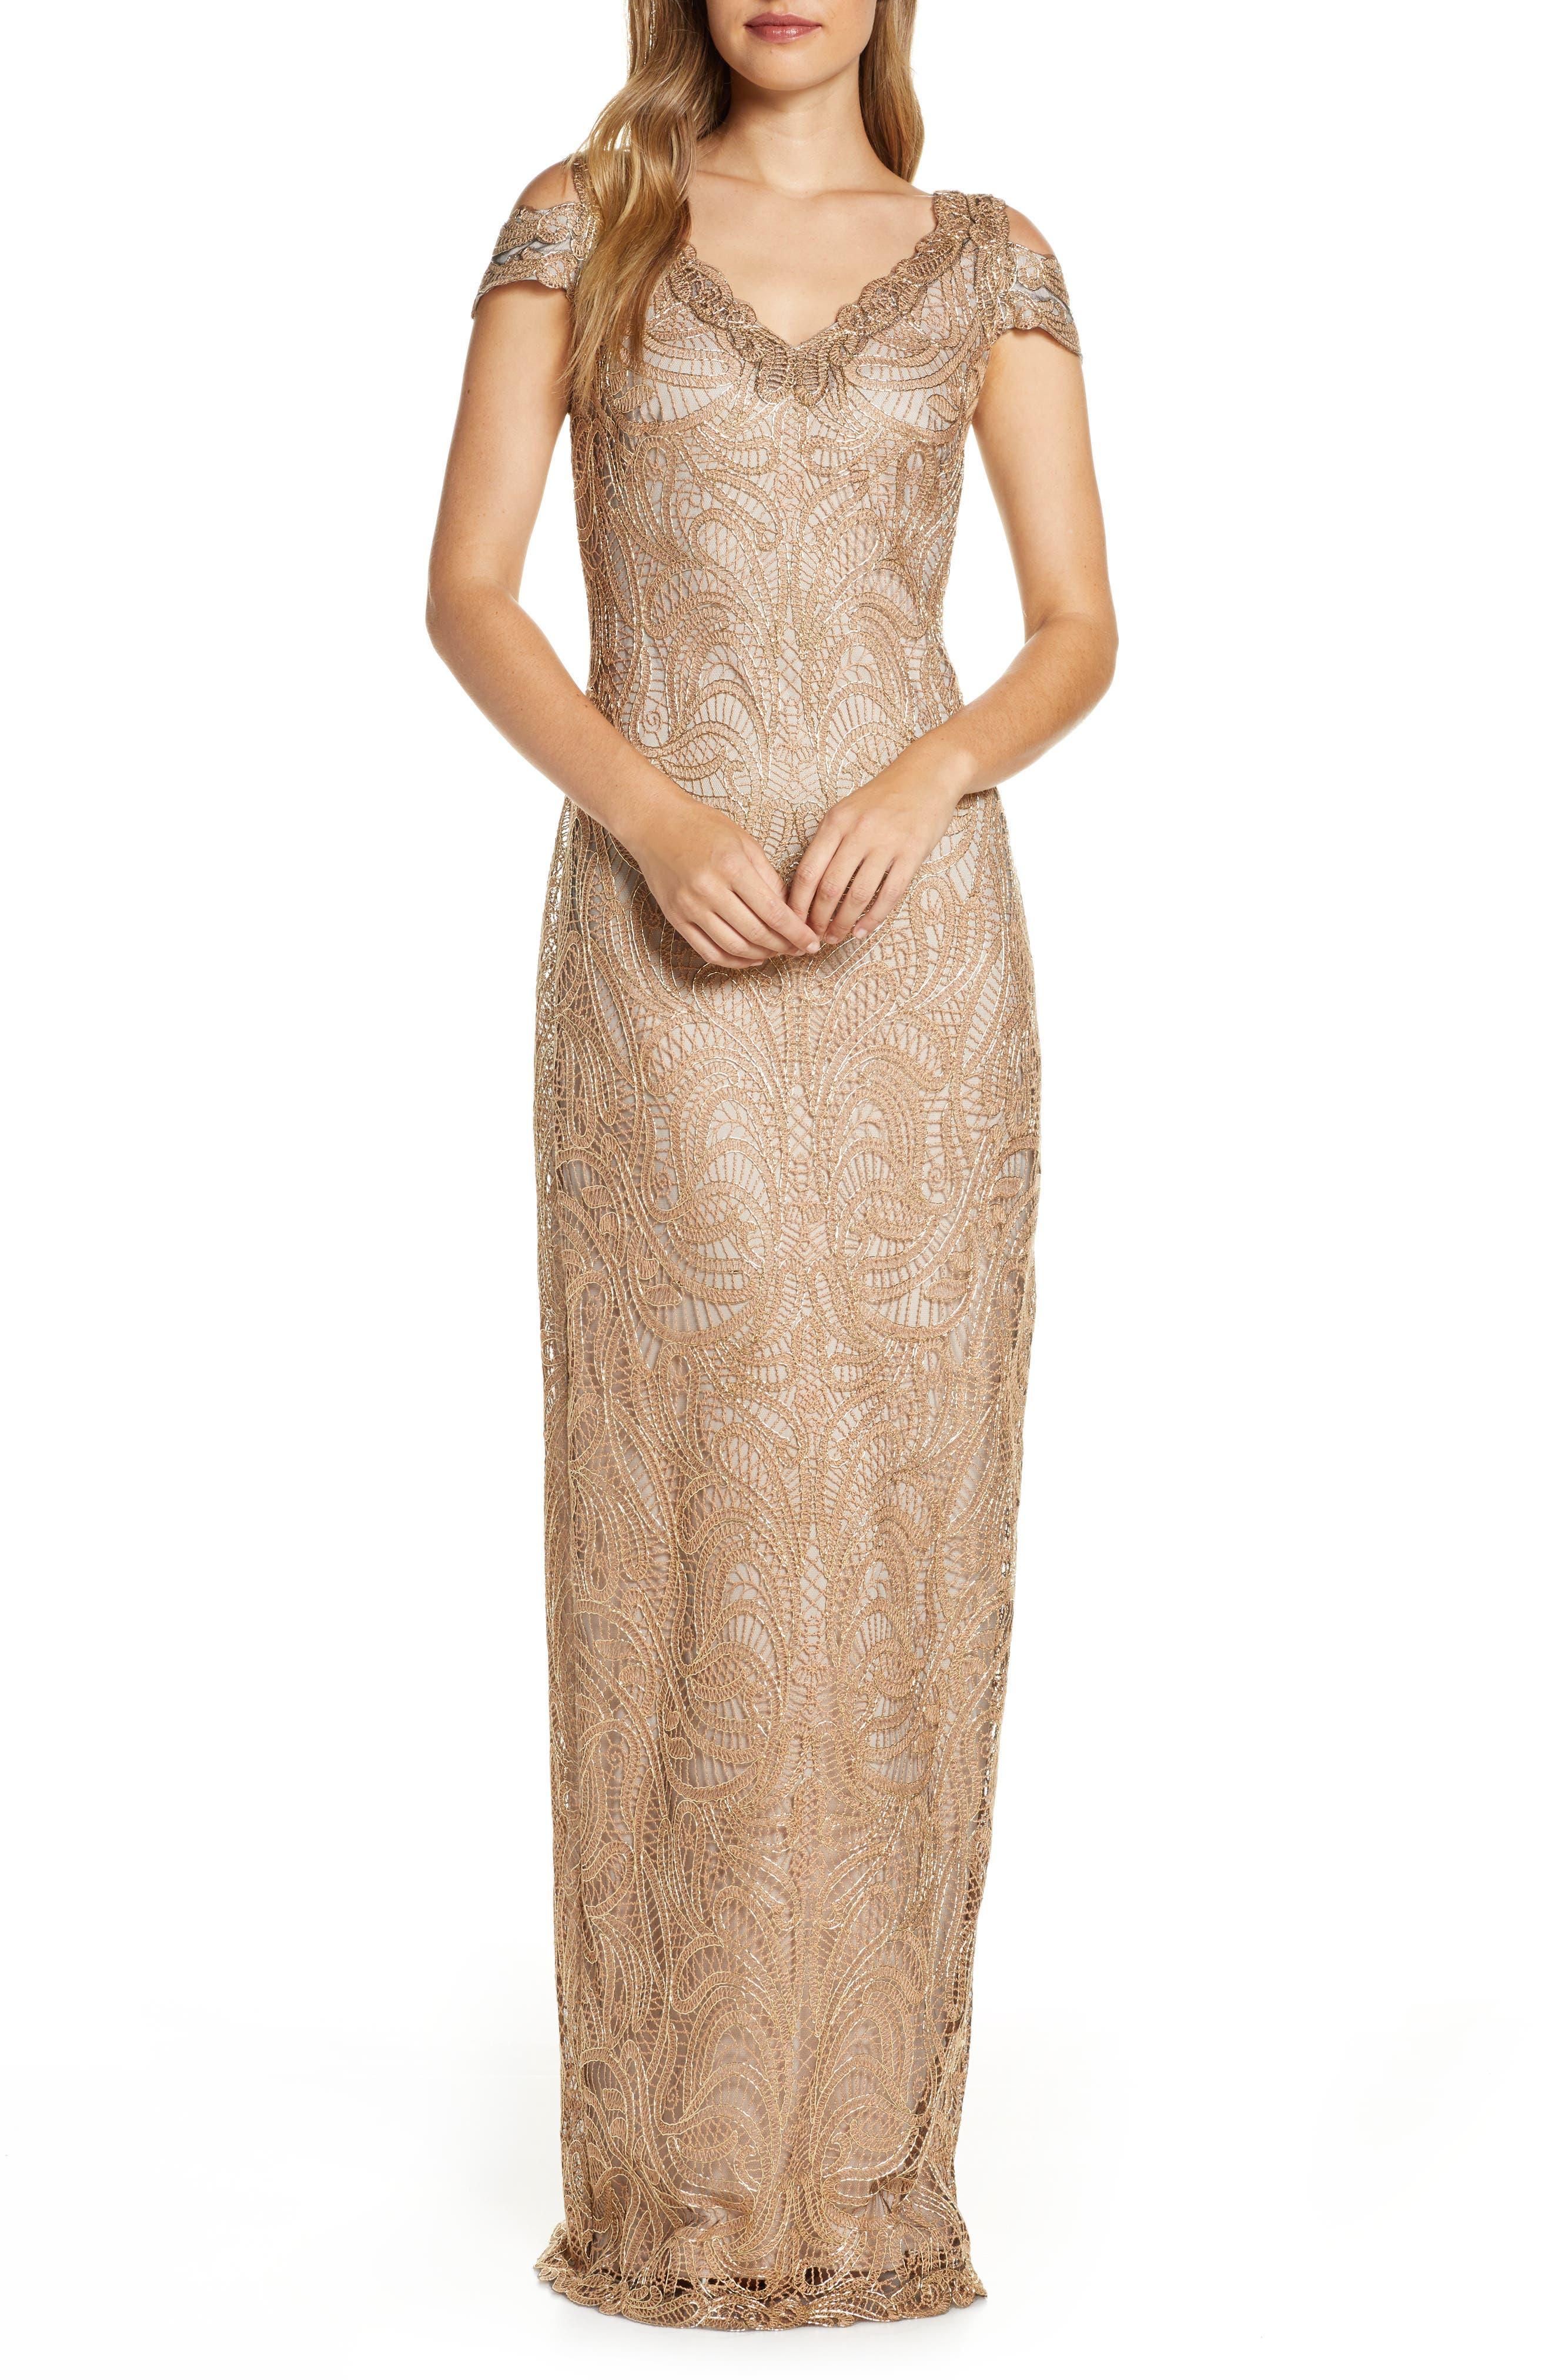 Titanic Dresses & Costumes   1912 Dresses Womens Tadashi Shoji Cold Shoulder Lace Column Gown $308.00 AT vintagedancer.com